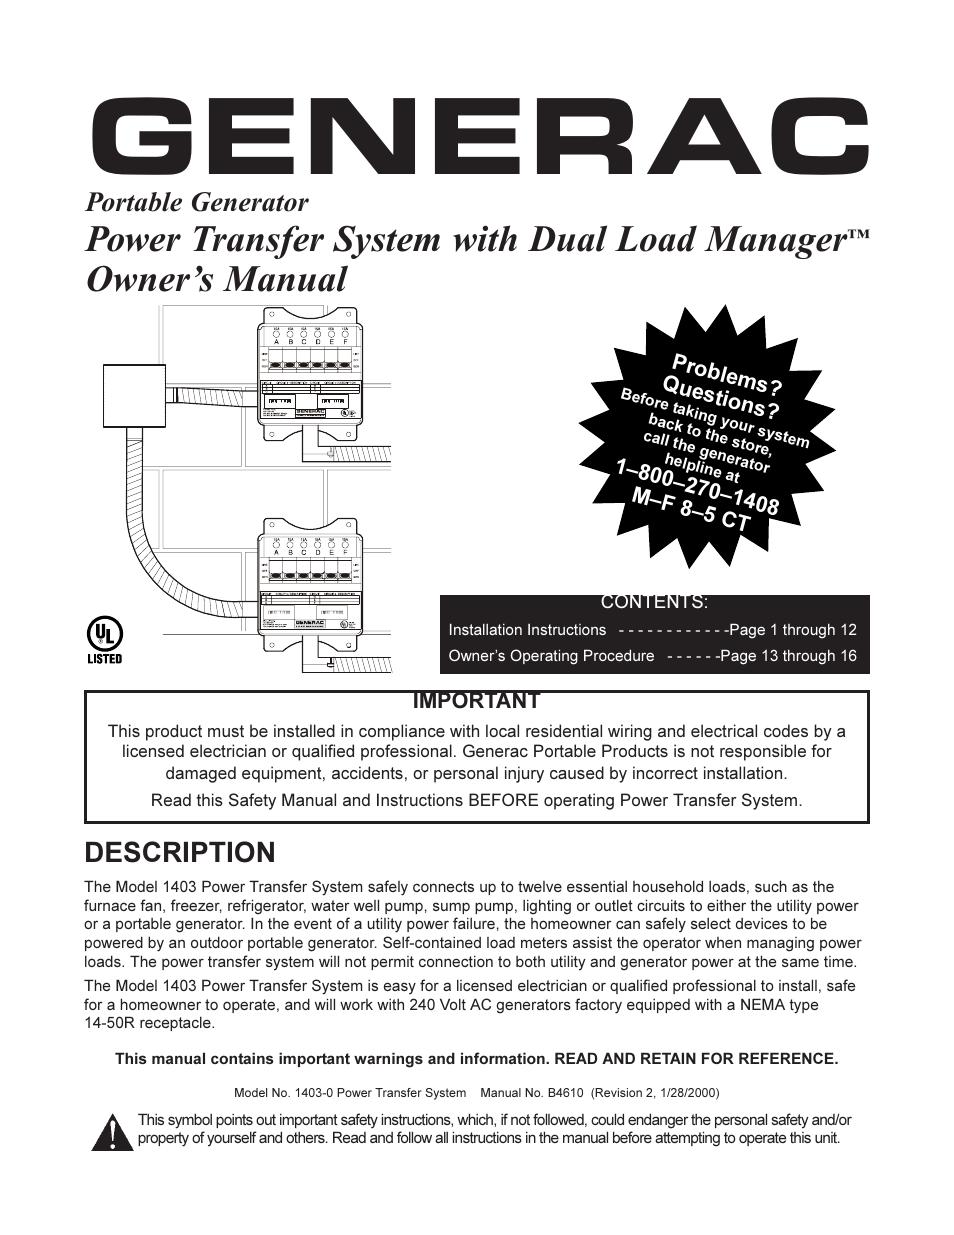 Generac Diagram Wiring 004678 2. . Wiring Diagram For Electrical on